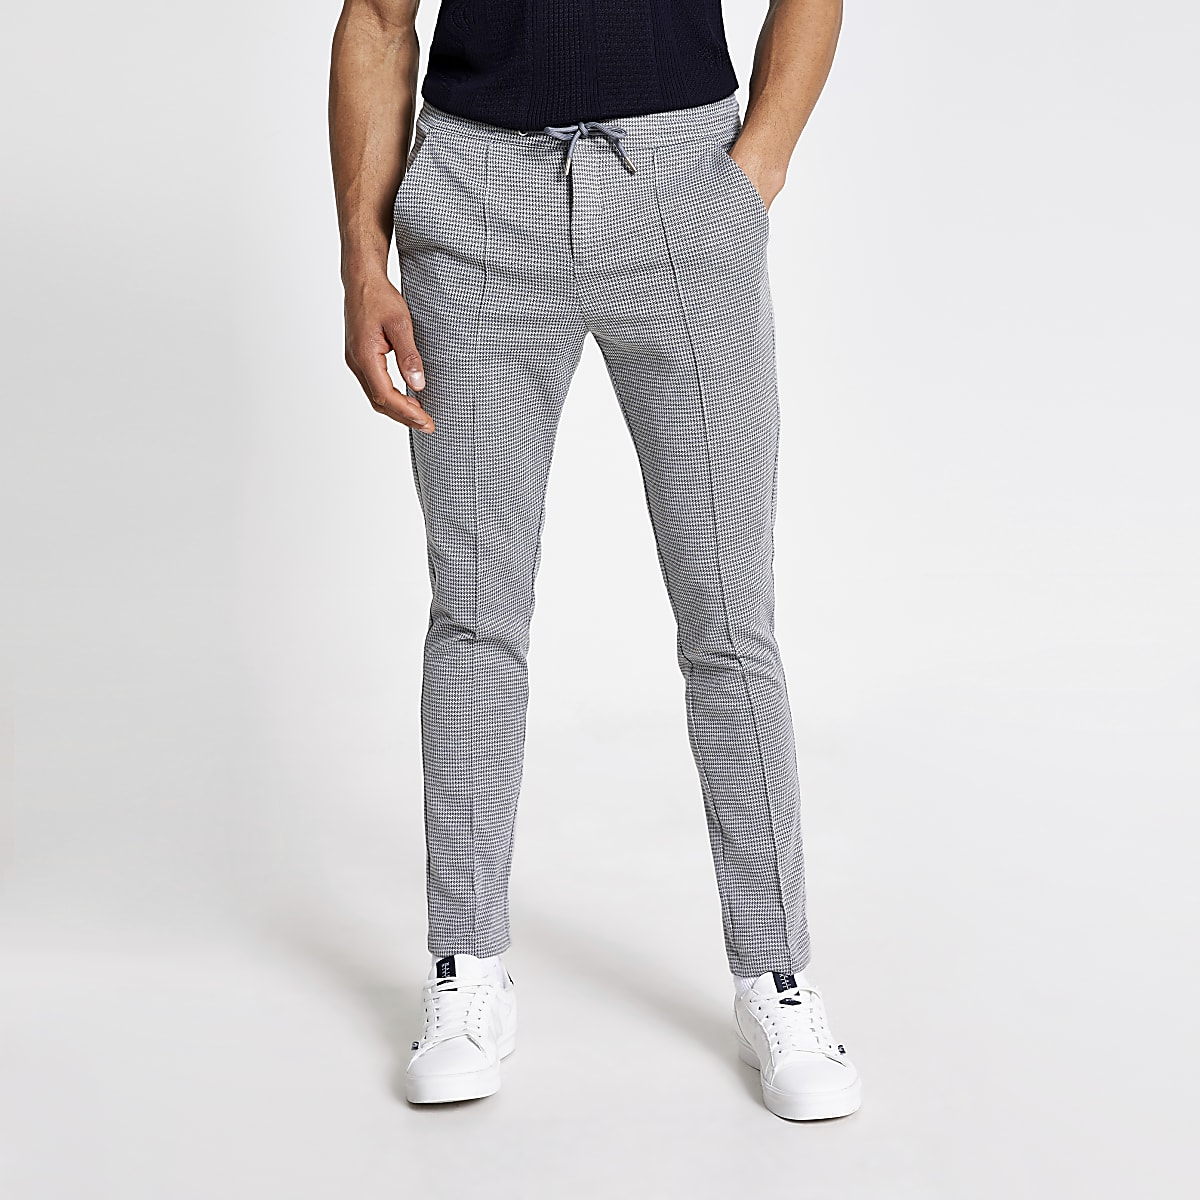 Graue, elegante Skinny-Jogginghose